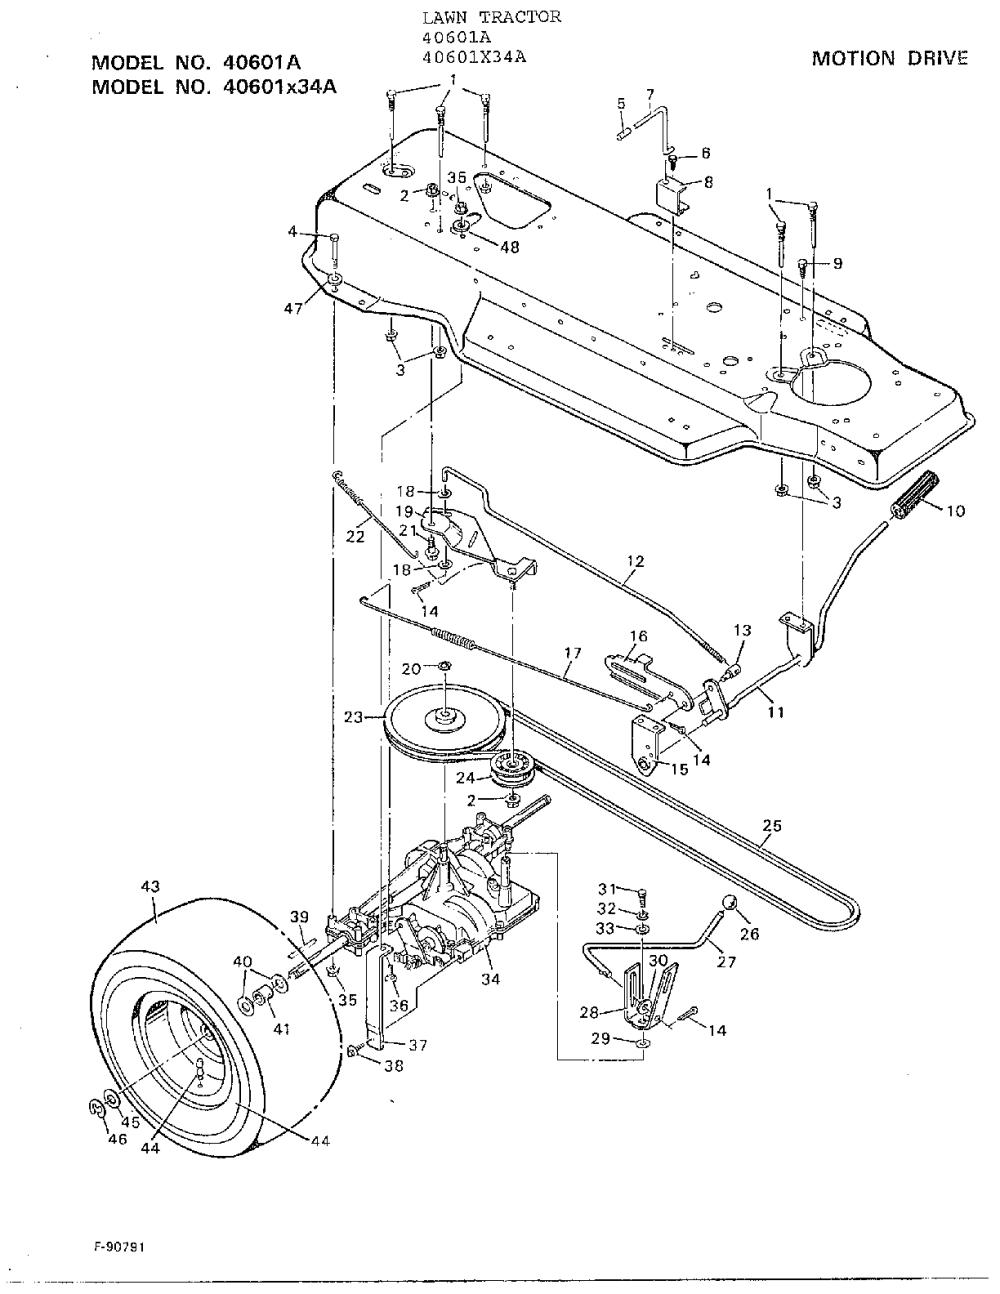 medium resolution of murray 40601a motion drive diagram